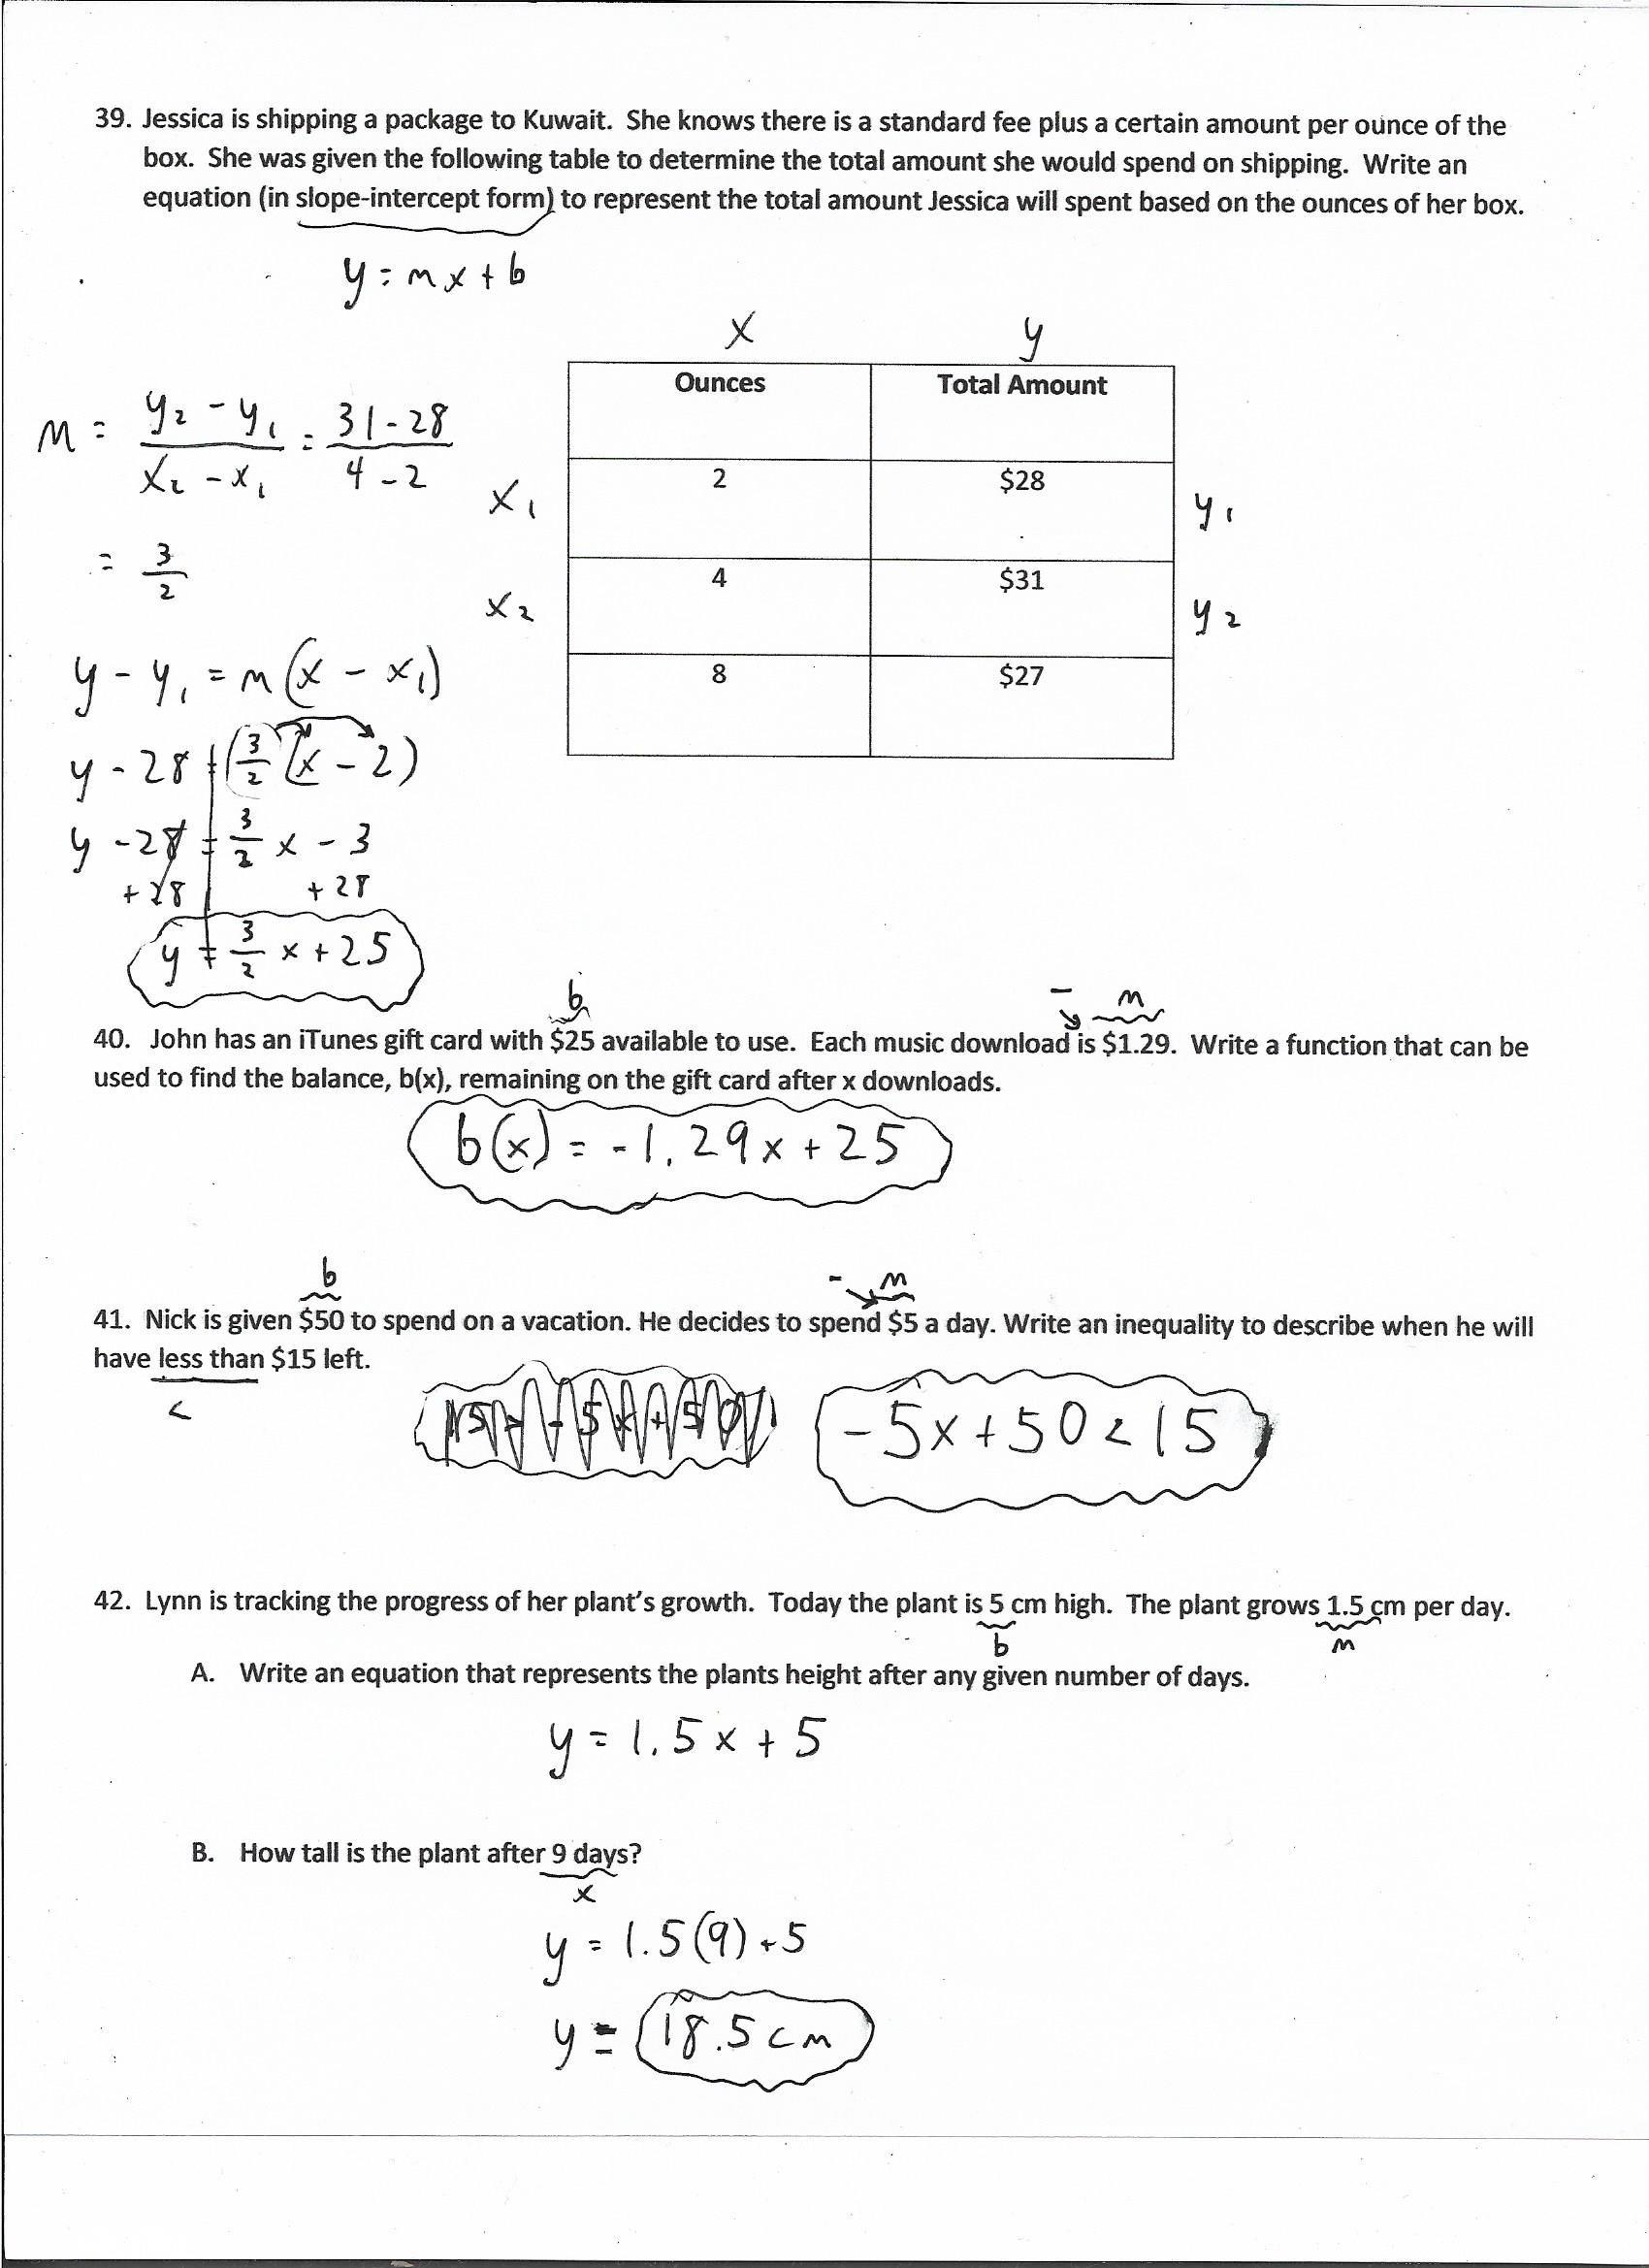 Akins high school final exam study guide answers falaconquin